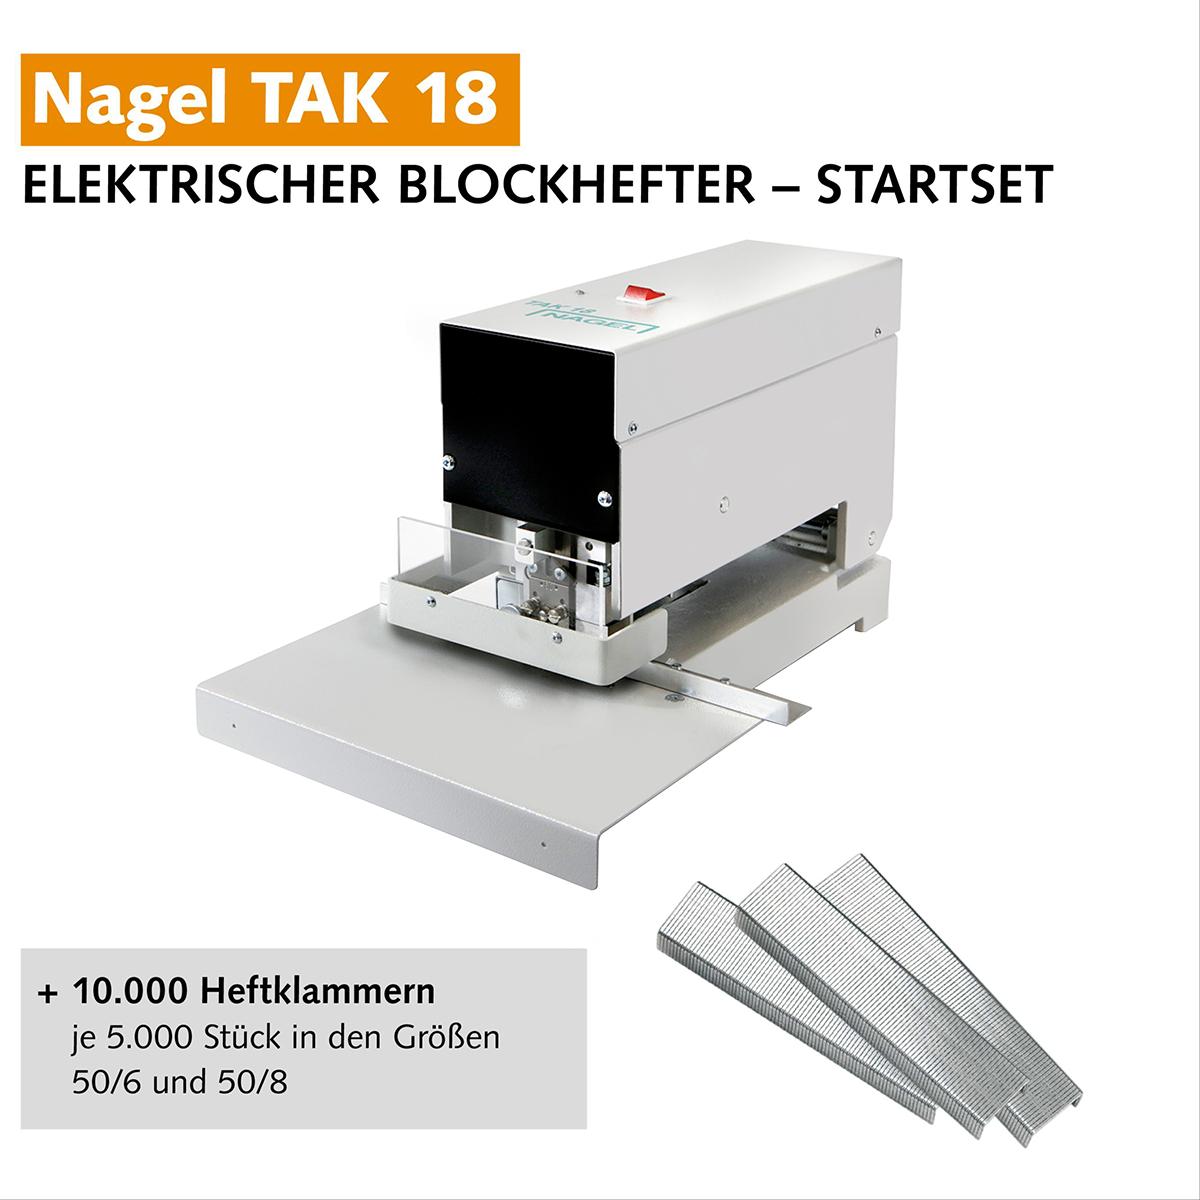 Nagel-TAK-18-Starterset